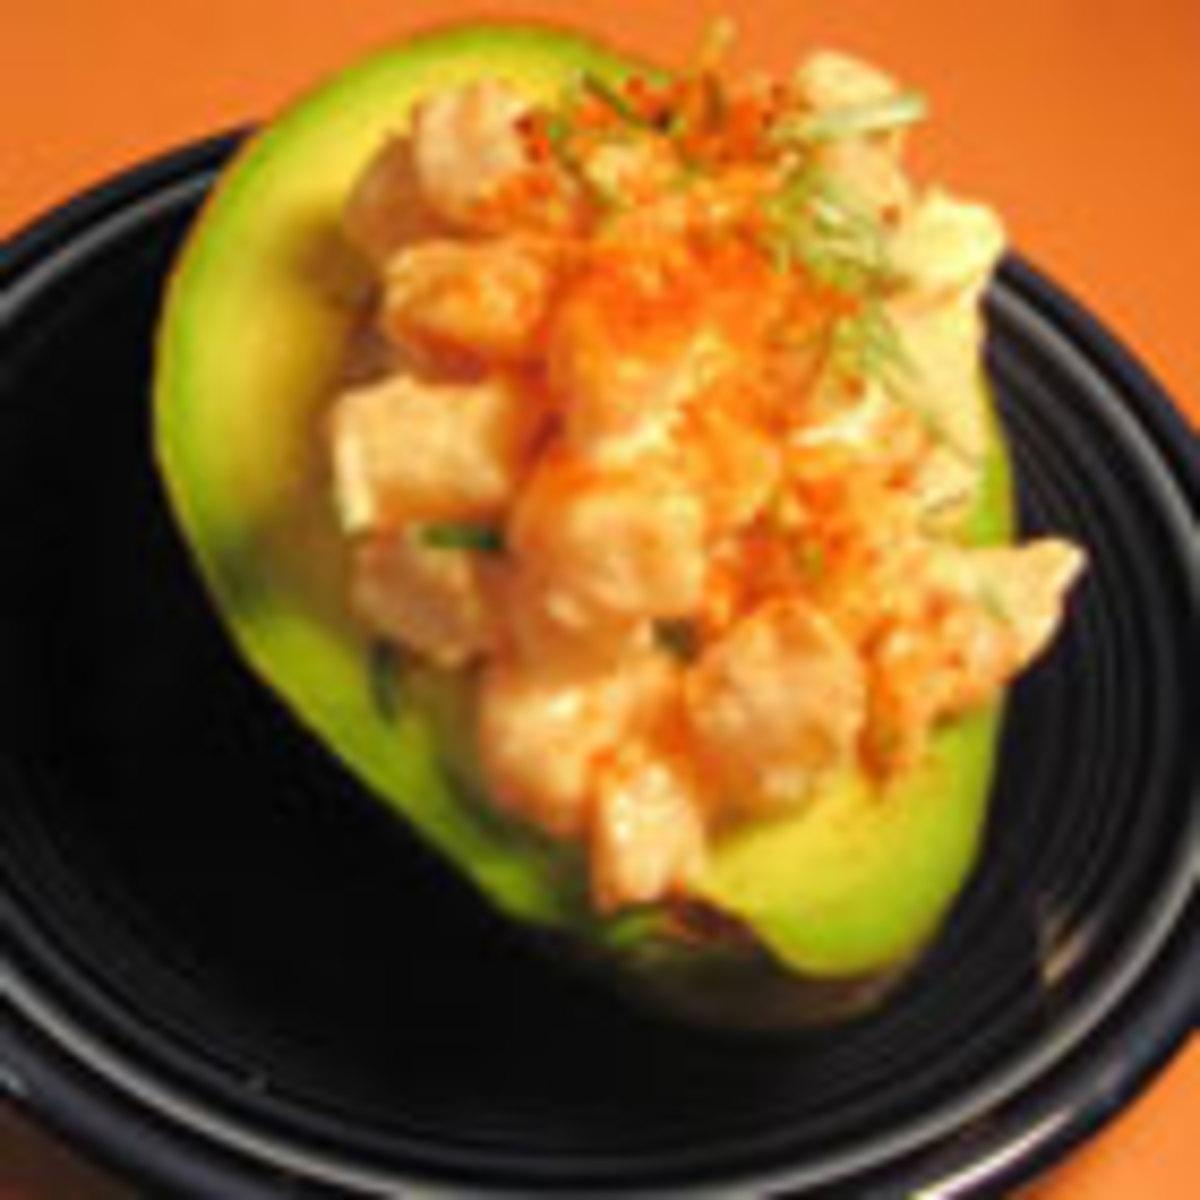 Shrimp and Avocado Salad (from Allrecipes)